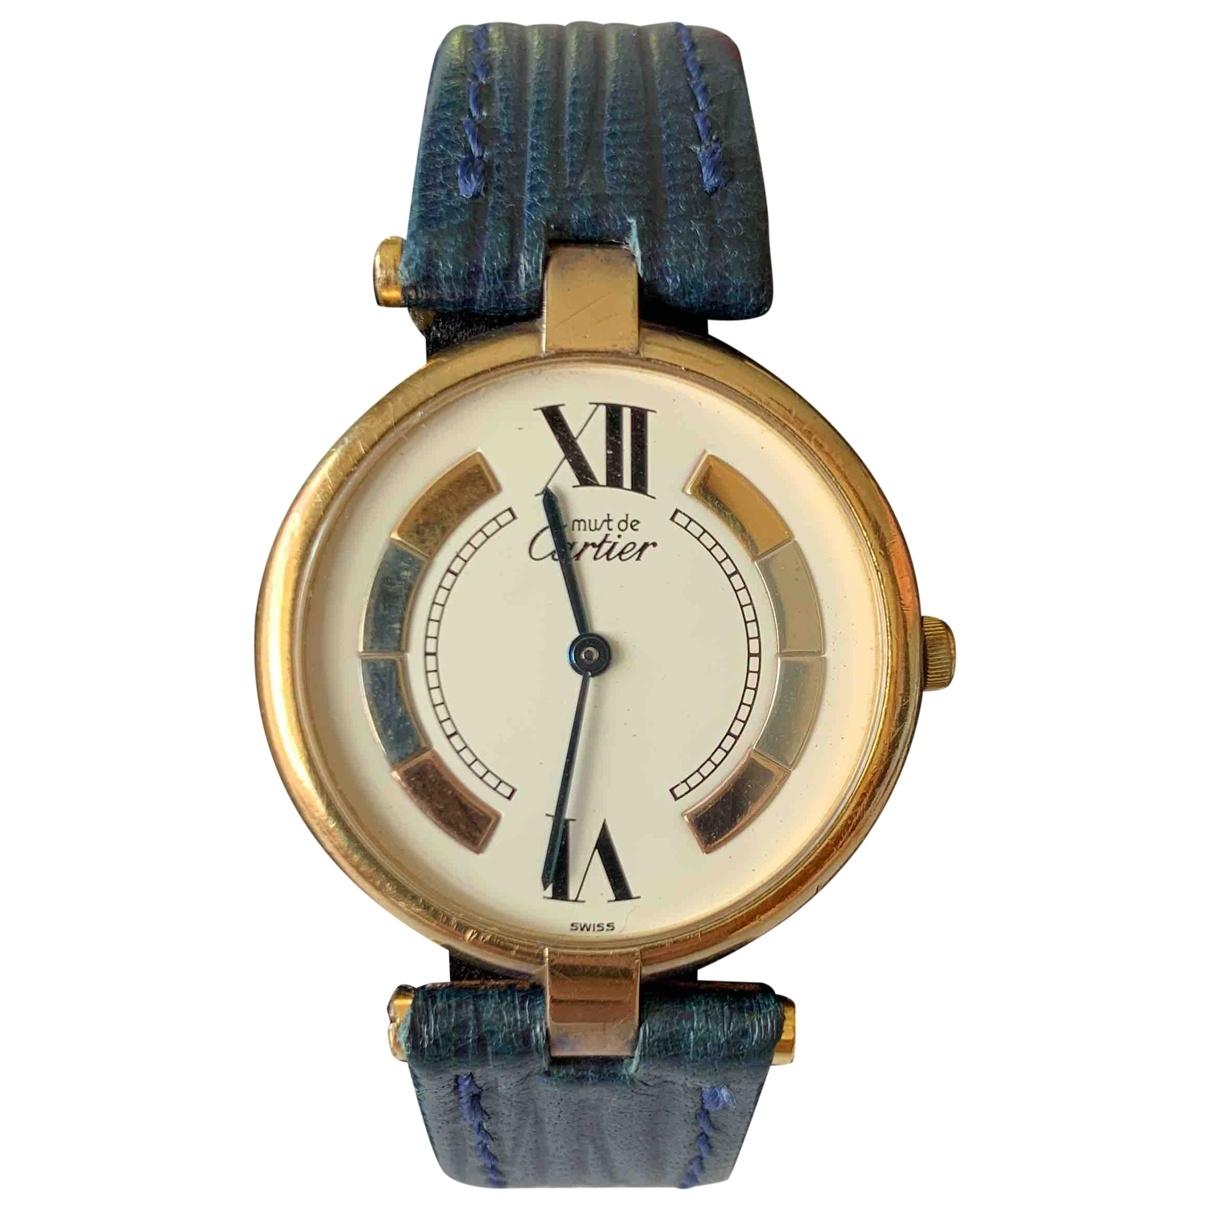 Relojes Must Trinity de Bermellon Cartier